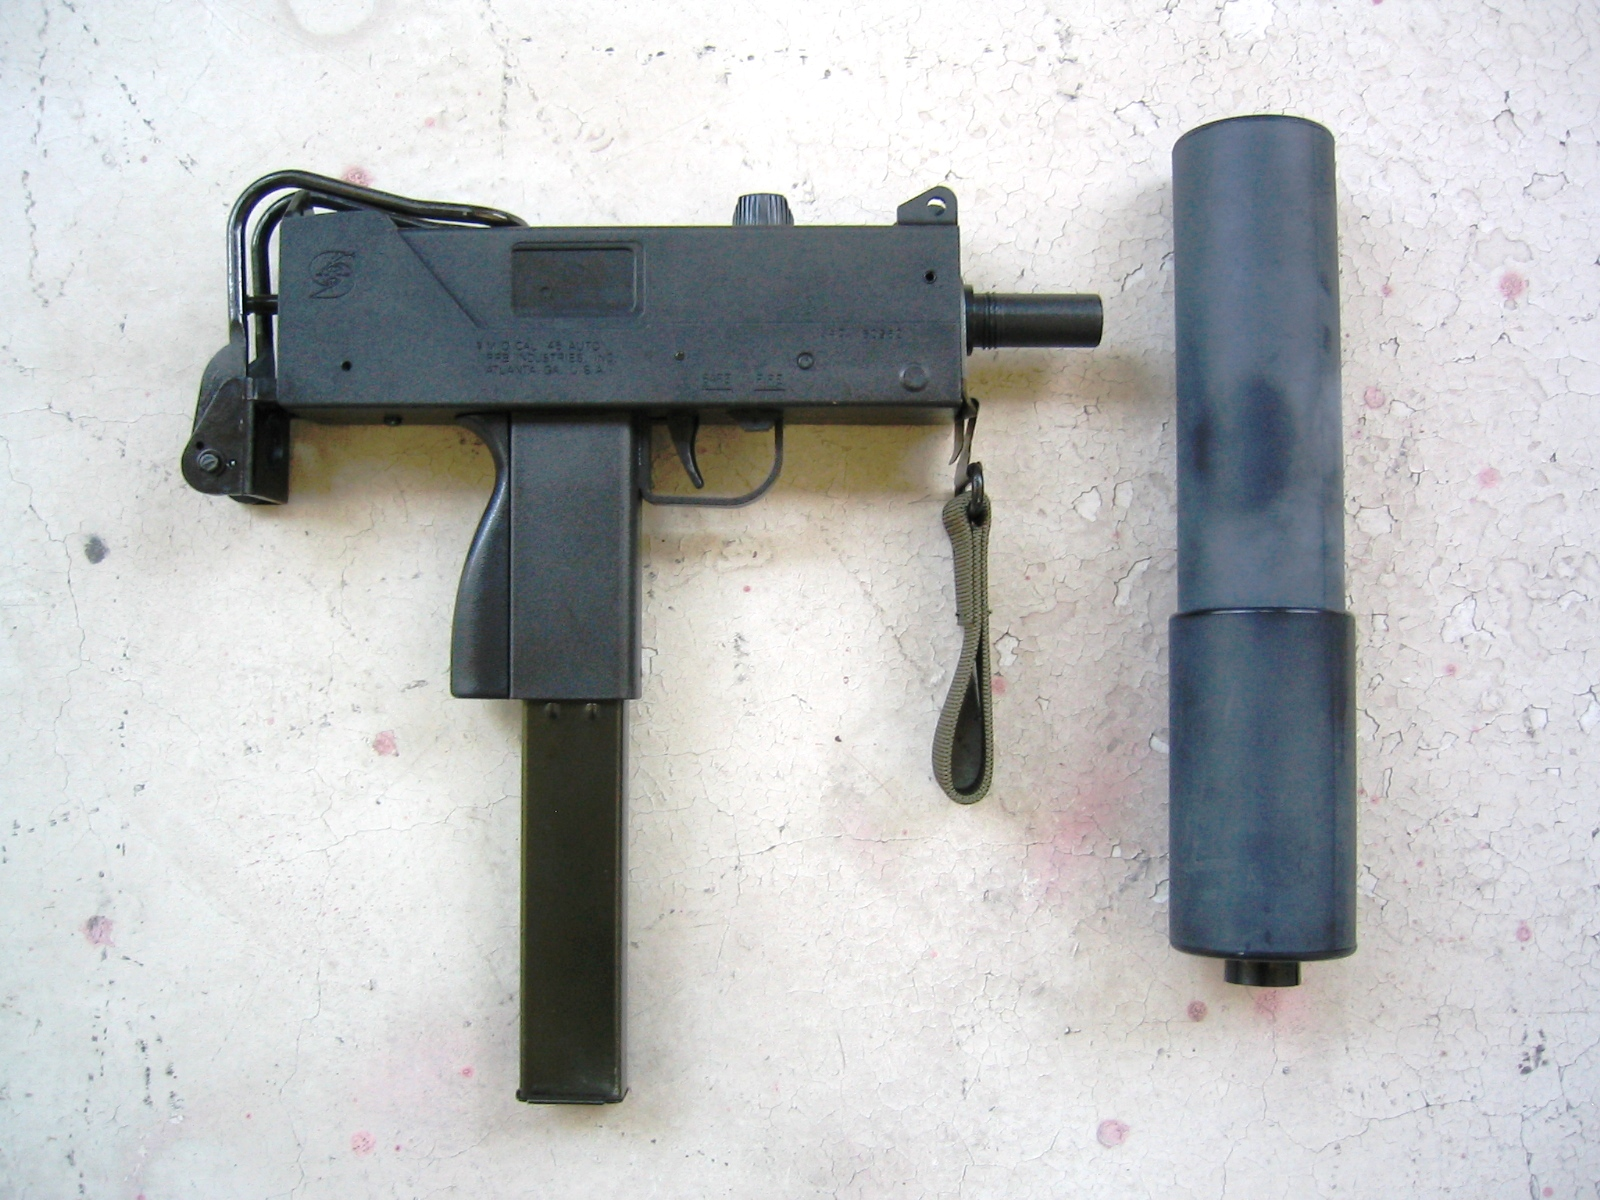 mac 12 gun - photo #14